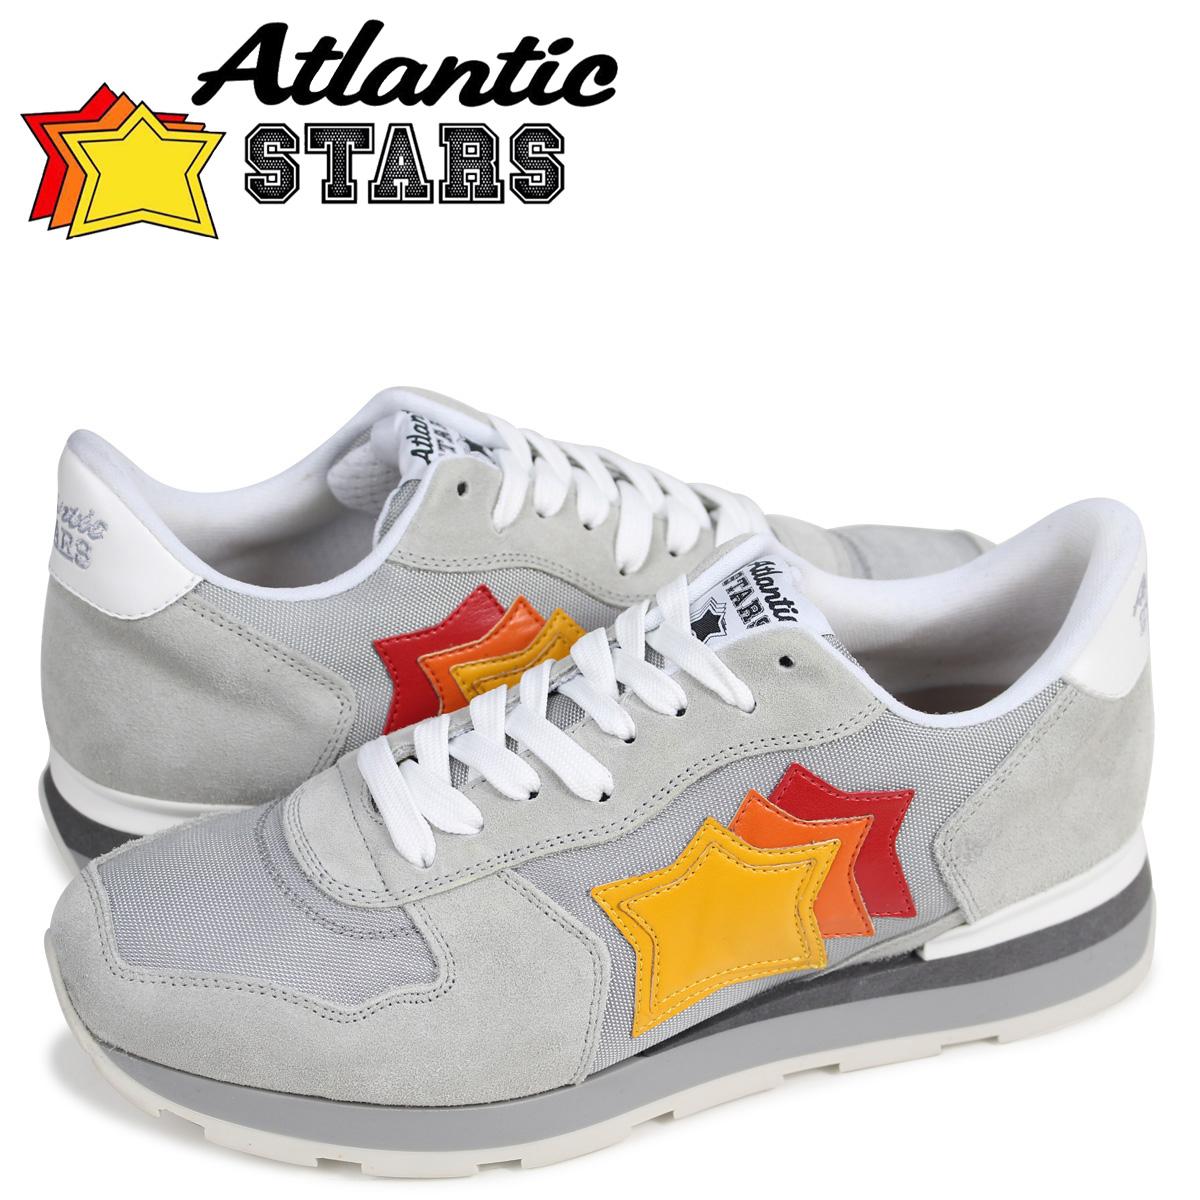 Atlantic STARS メンズ スニーカー アトランティックスターズアンタレス ANTARES SBB-63B グレー